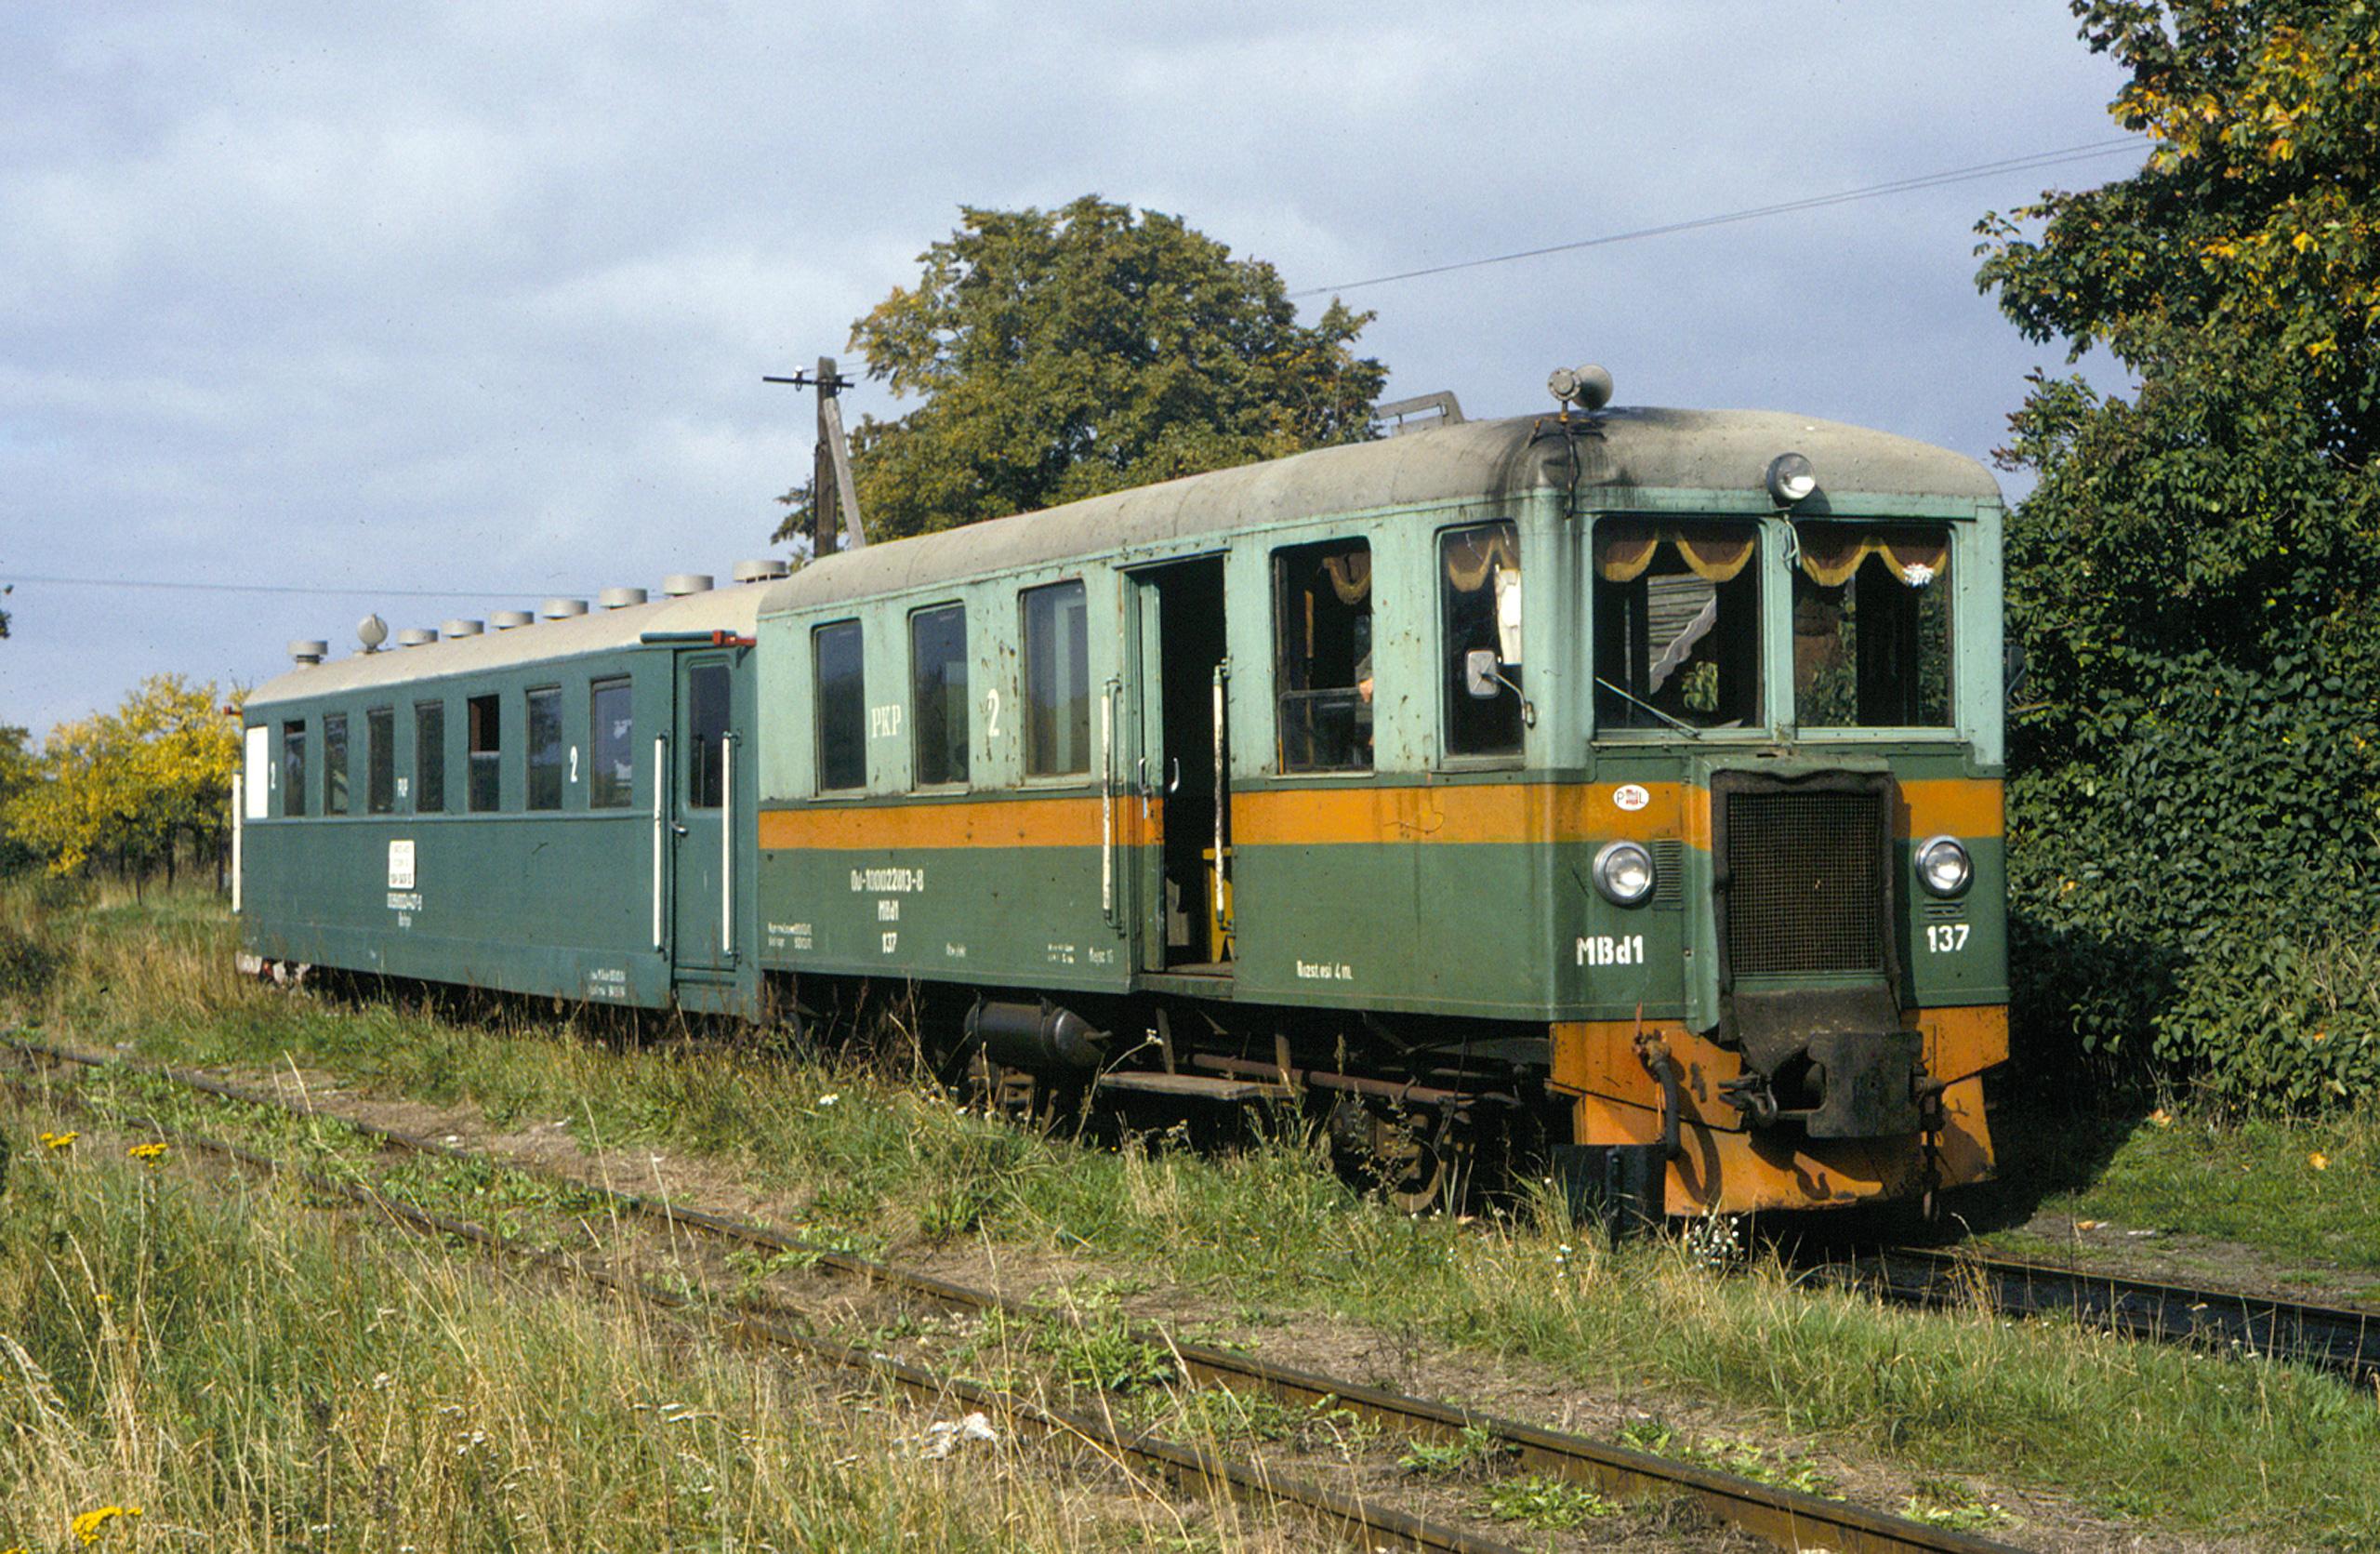 Excursion train at Prawy Brzeg Wisły